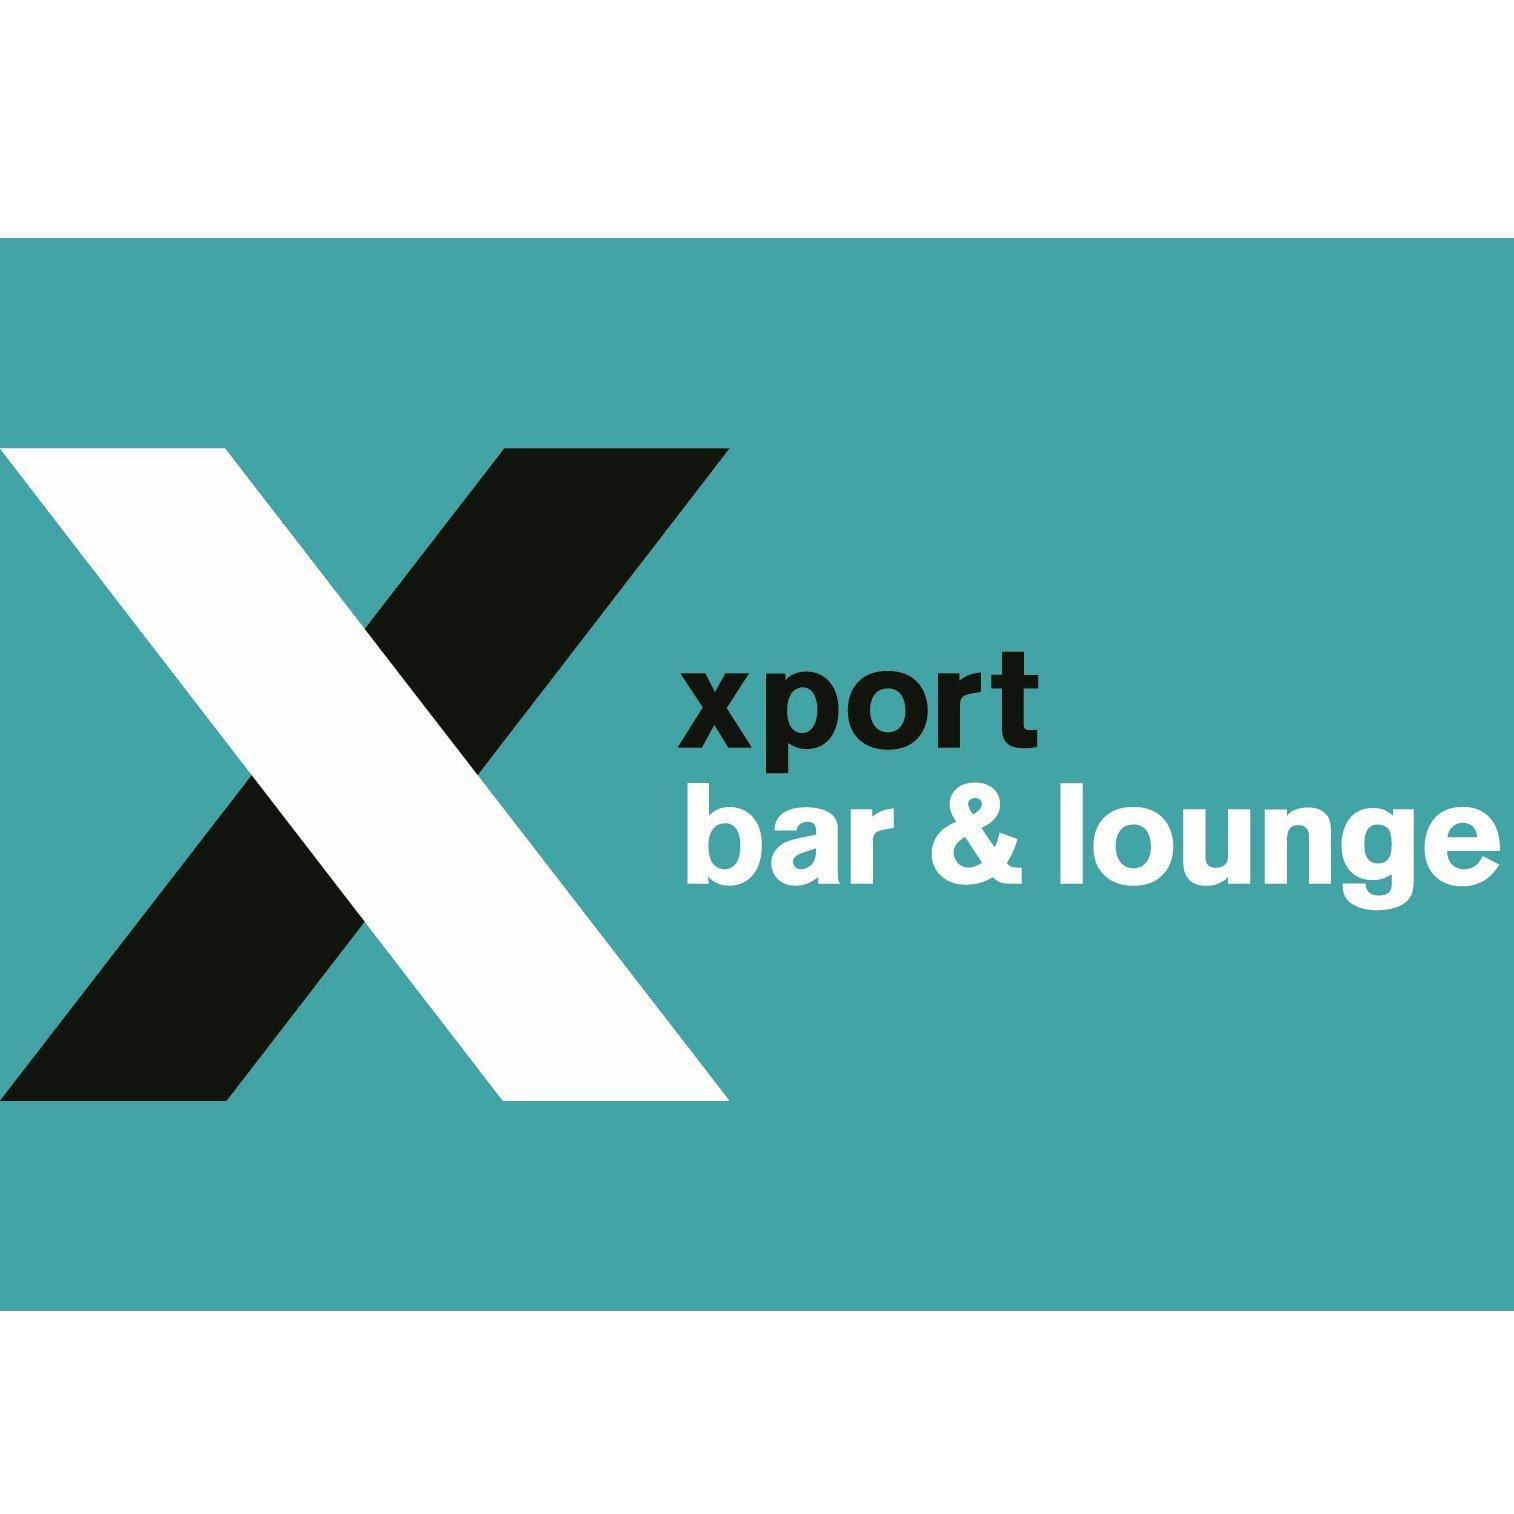 Xport Bar & Lounge - Portland, OR 97201 - (503)306-4835 | ShowMeLocal.com